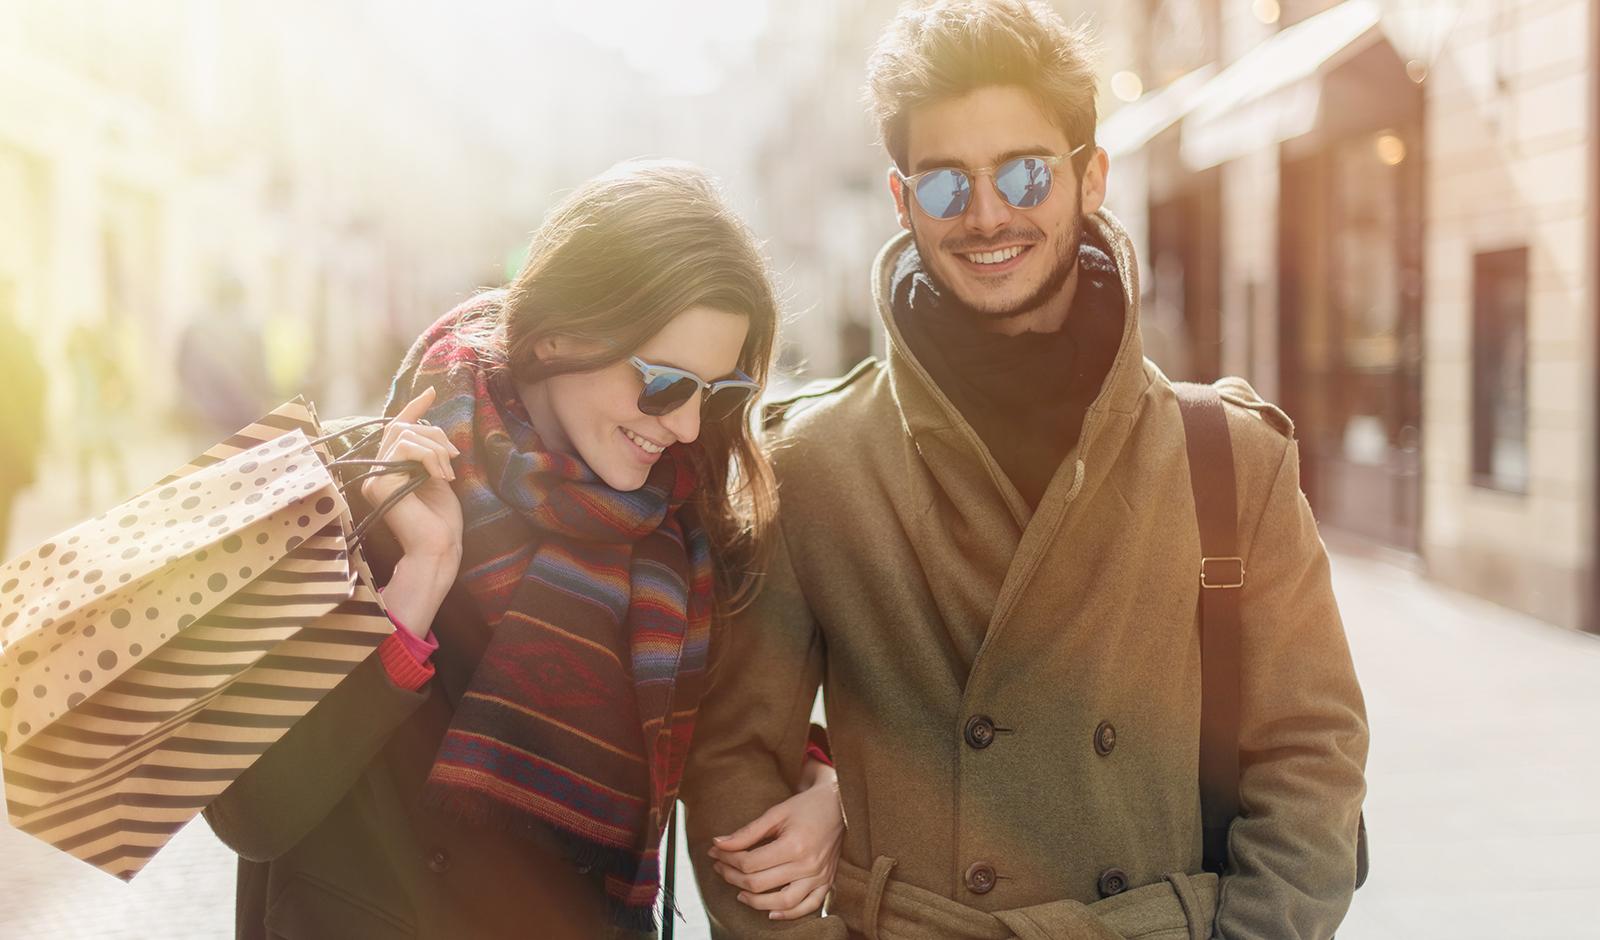 winter-fashion-couple-walking-down-the-street